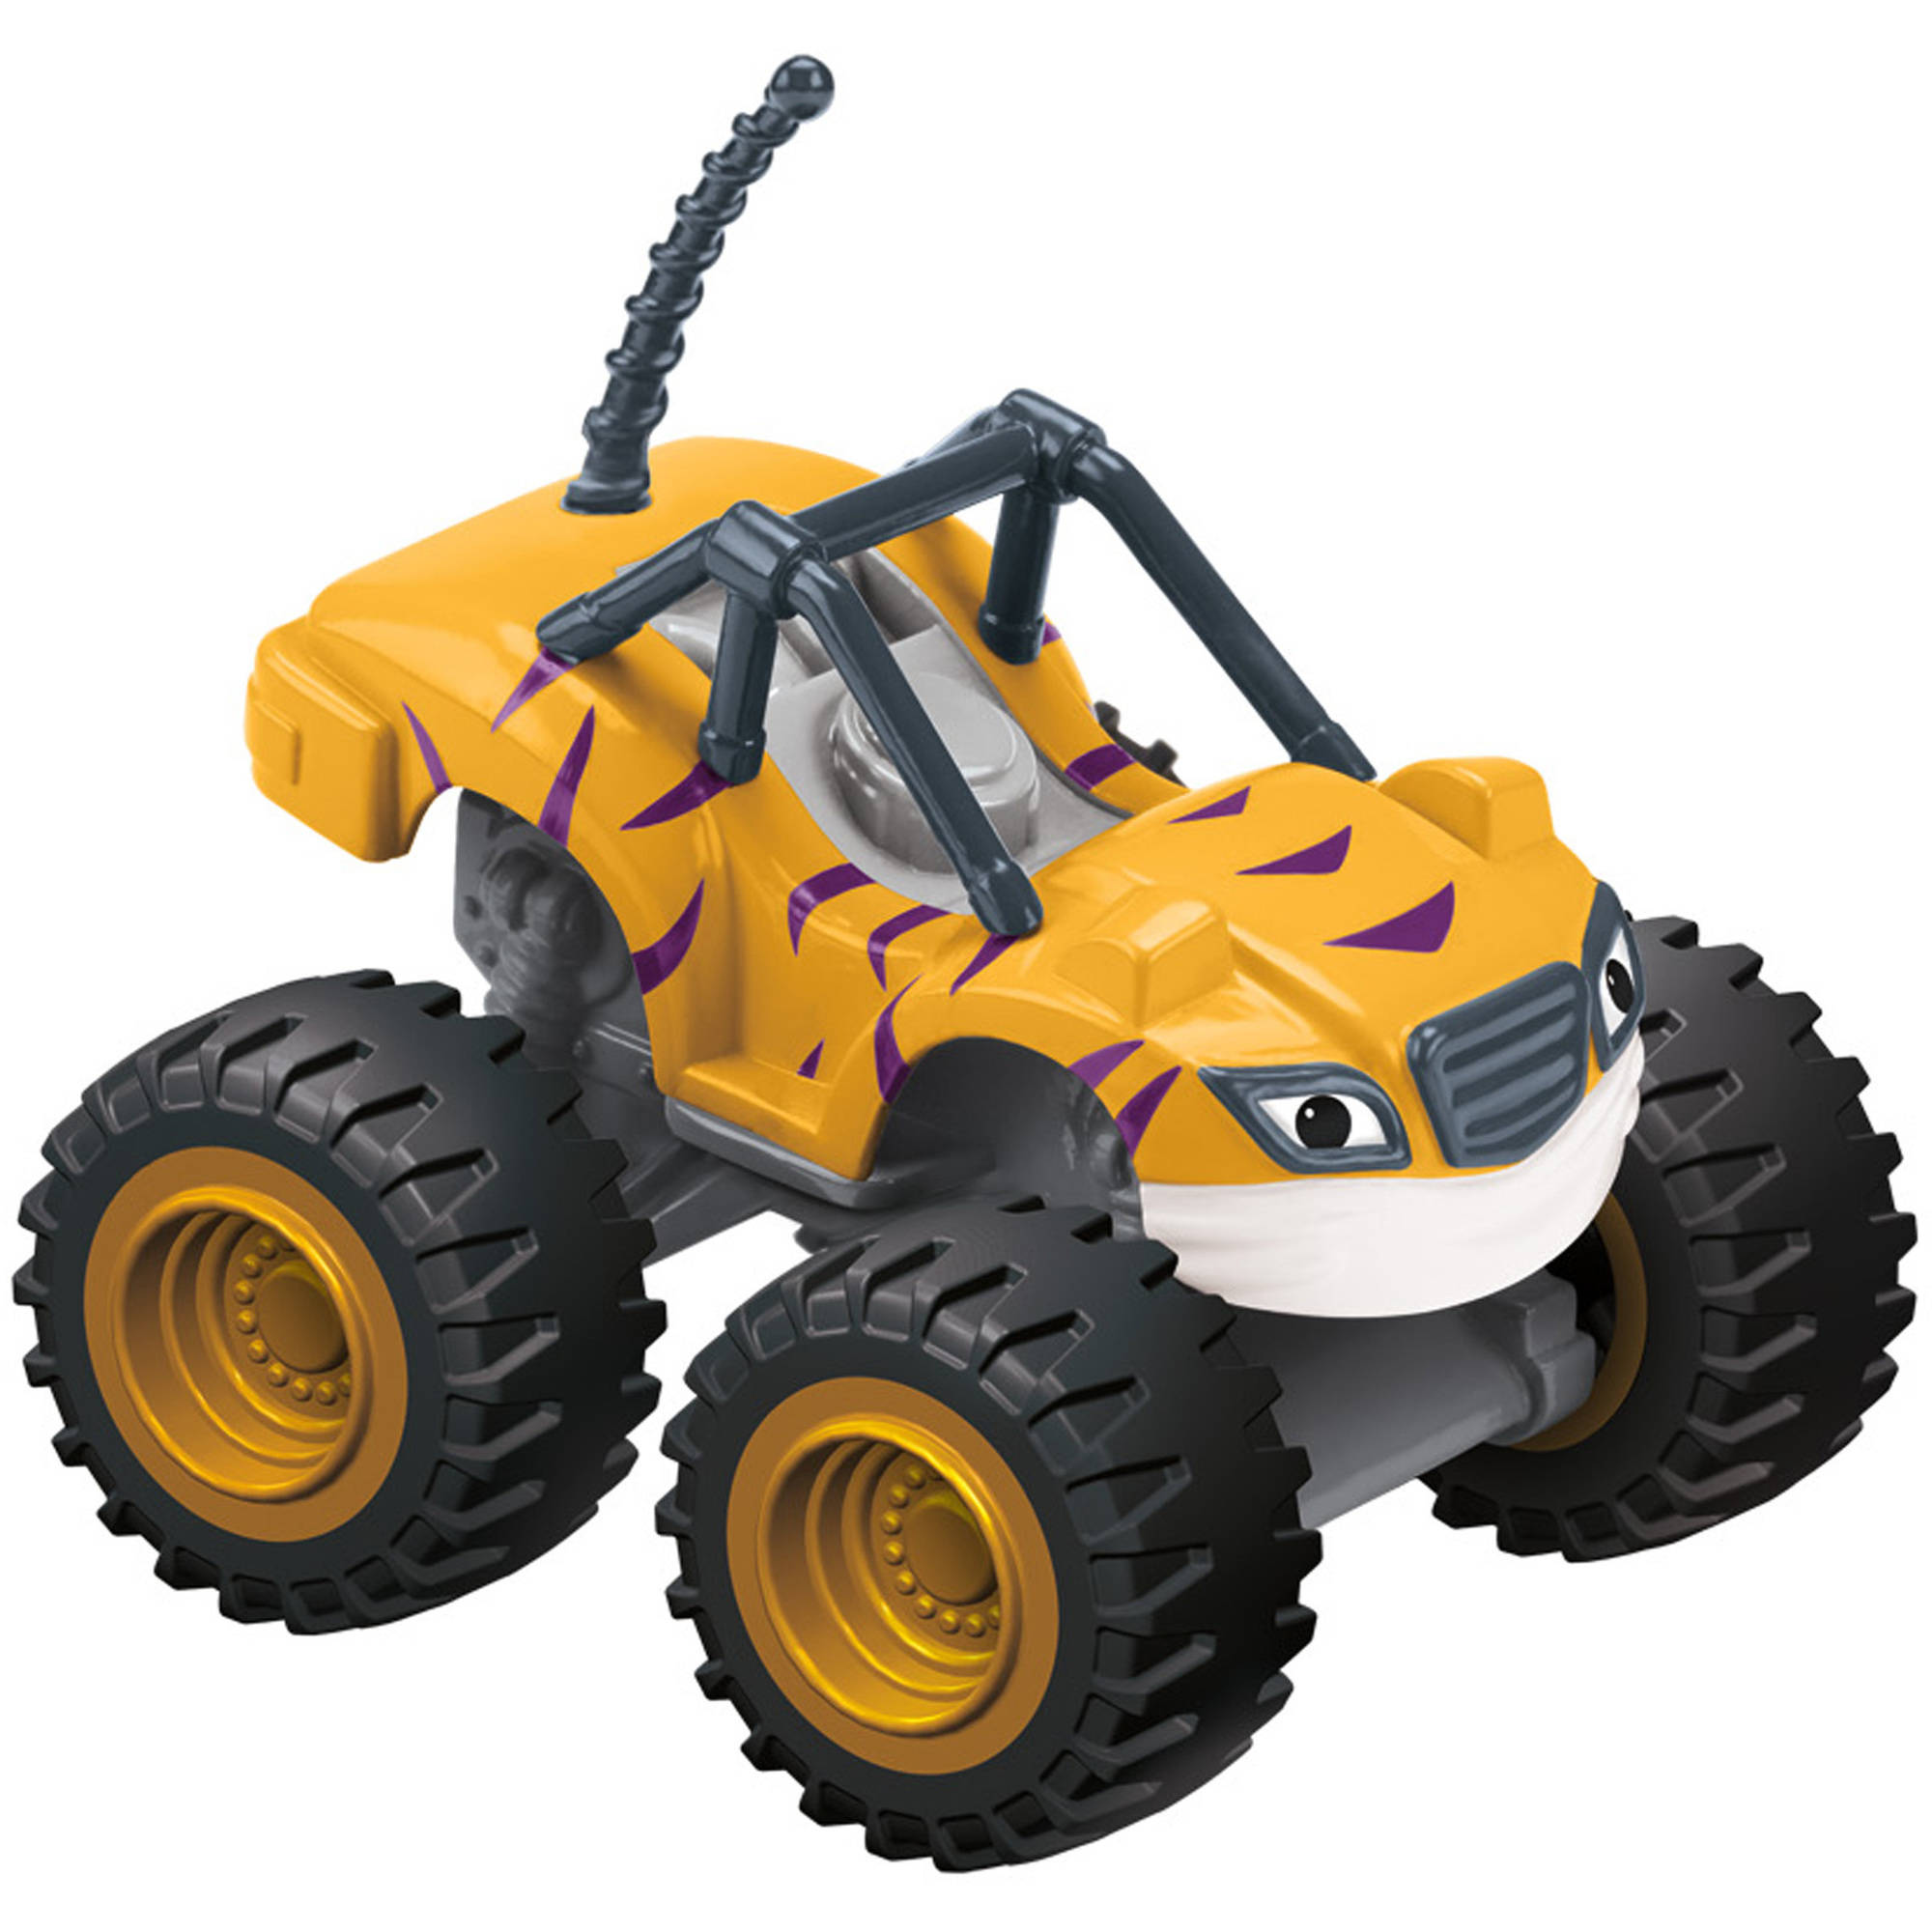 Nickelodeon Blaze and the Monster Machines Blaze Stripes Basic Vehicle